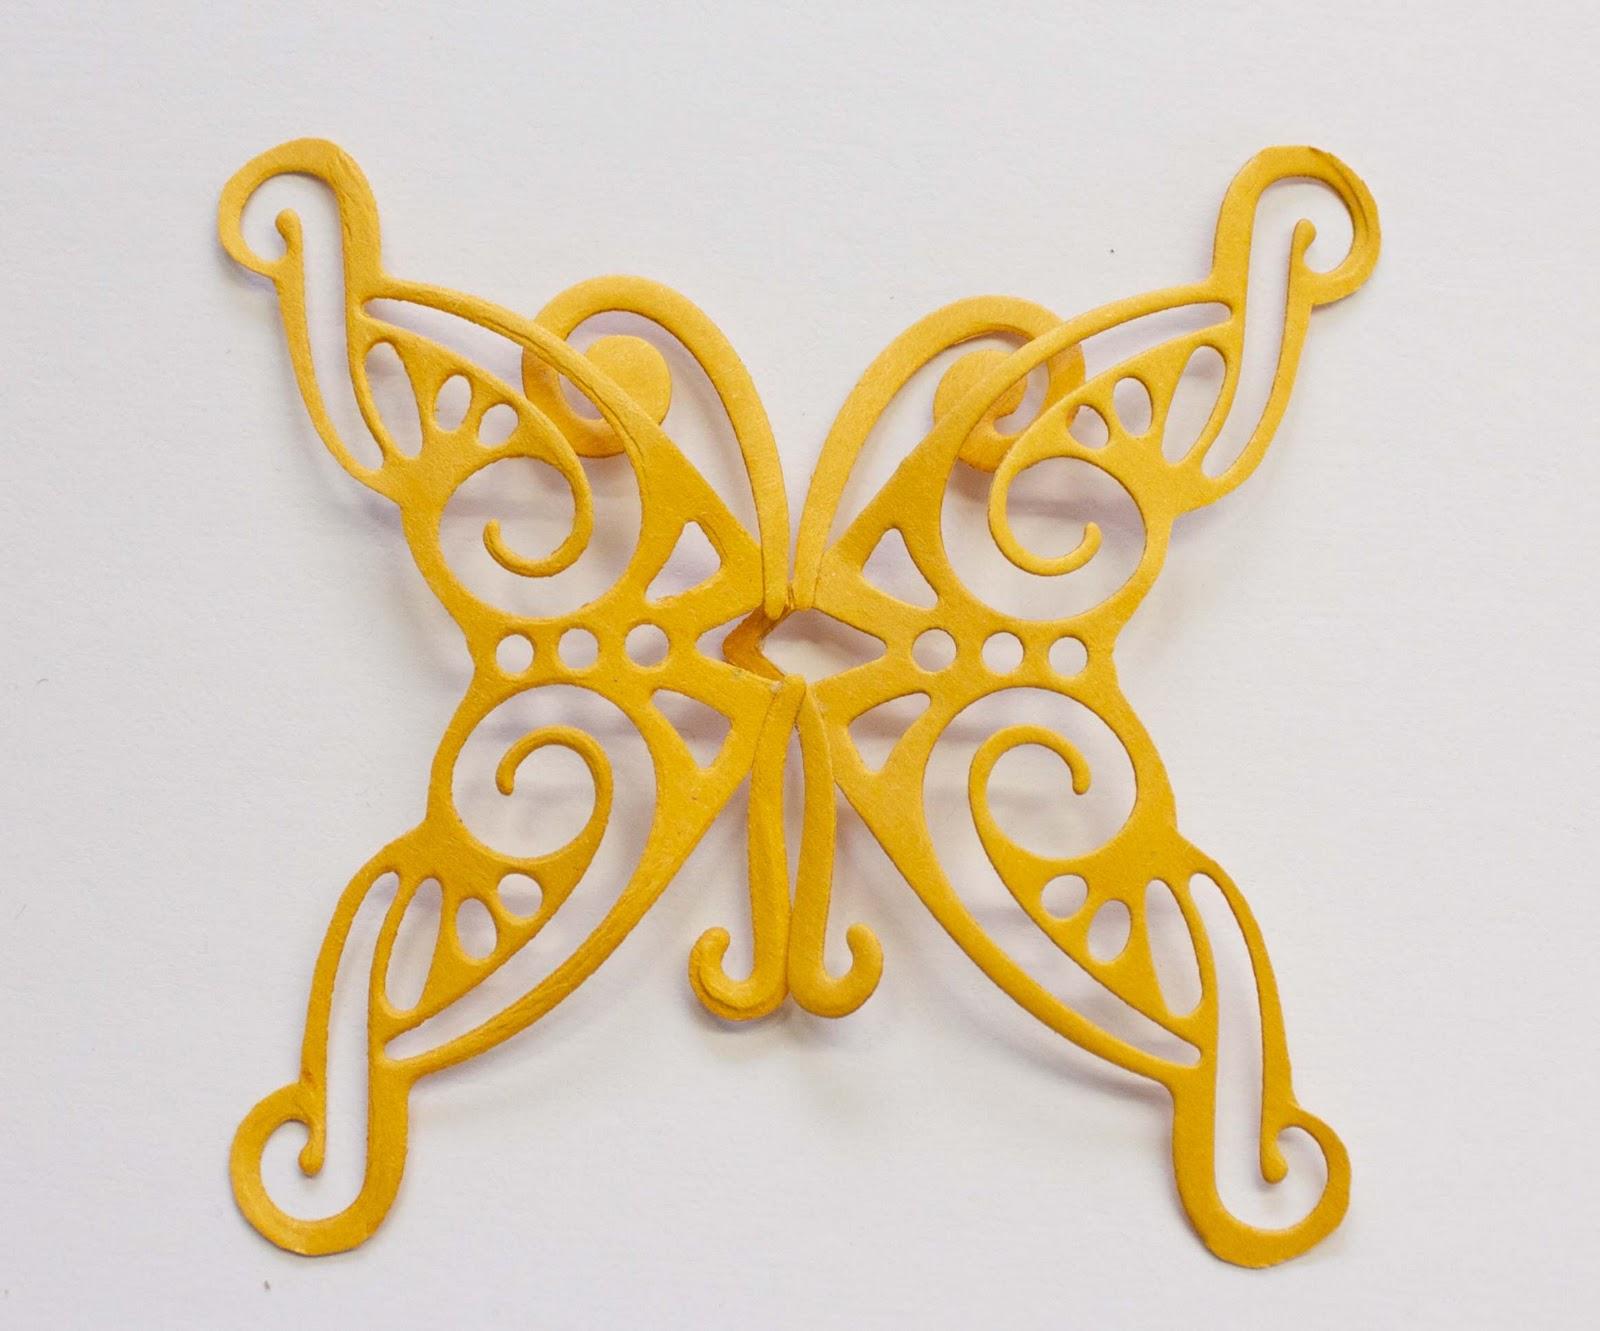 http://2.bp.blogspot.com/-IL3Bp8PP8Oc/TZxNaRNectI/AAAAAAAABeE/ae59GIjAnTc/s1600/Butterfly+tutorial+Loriete+6.jpg